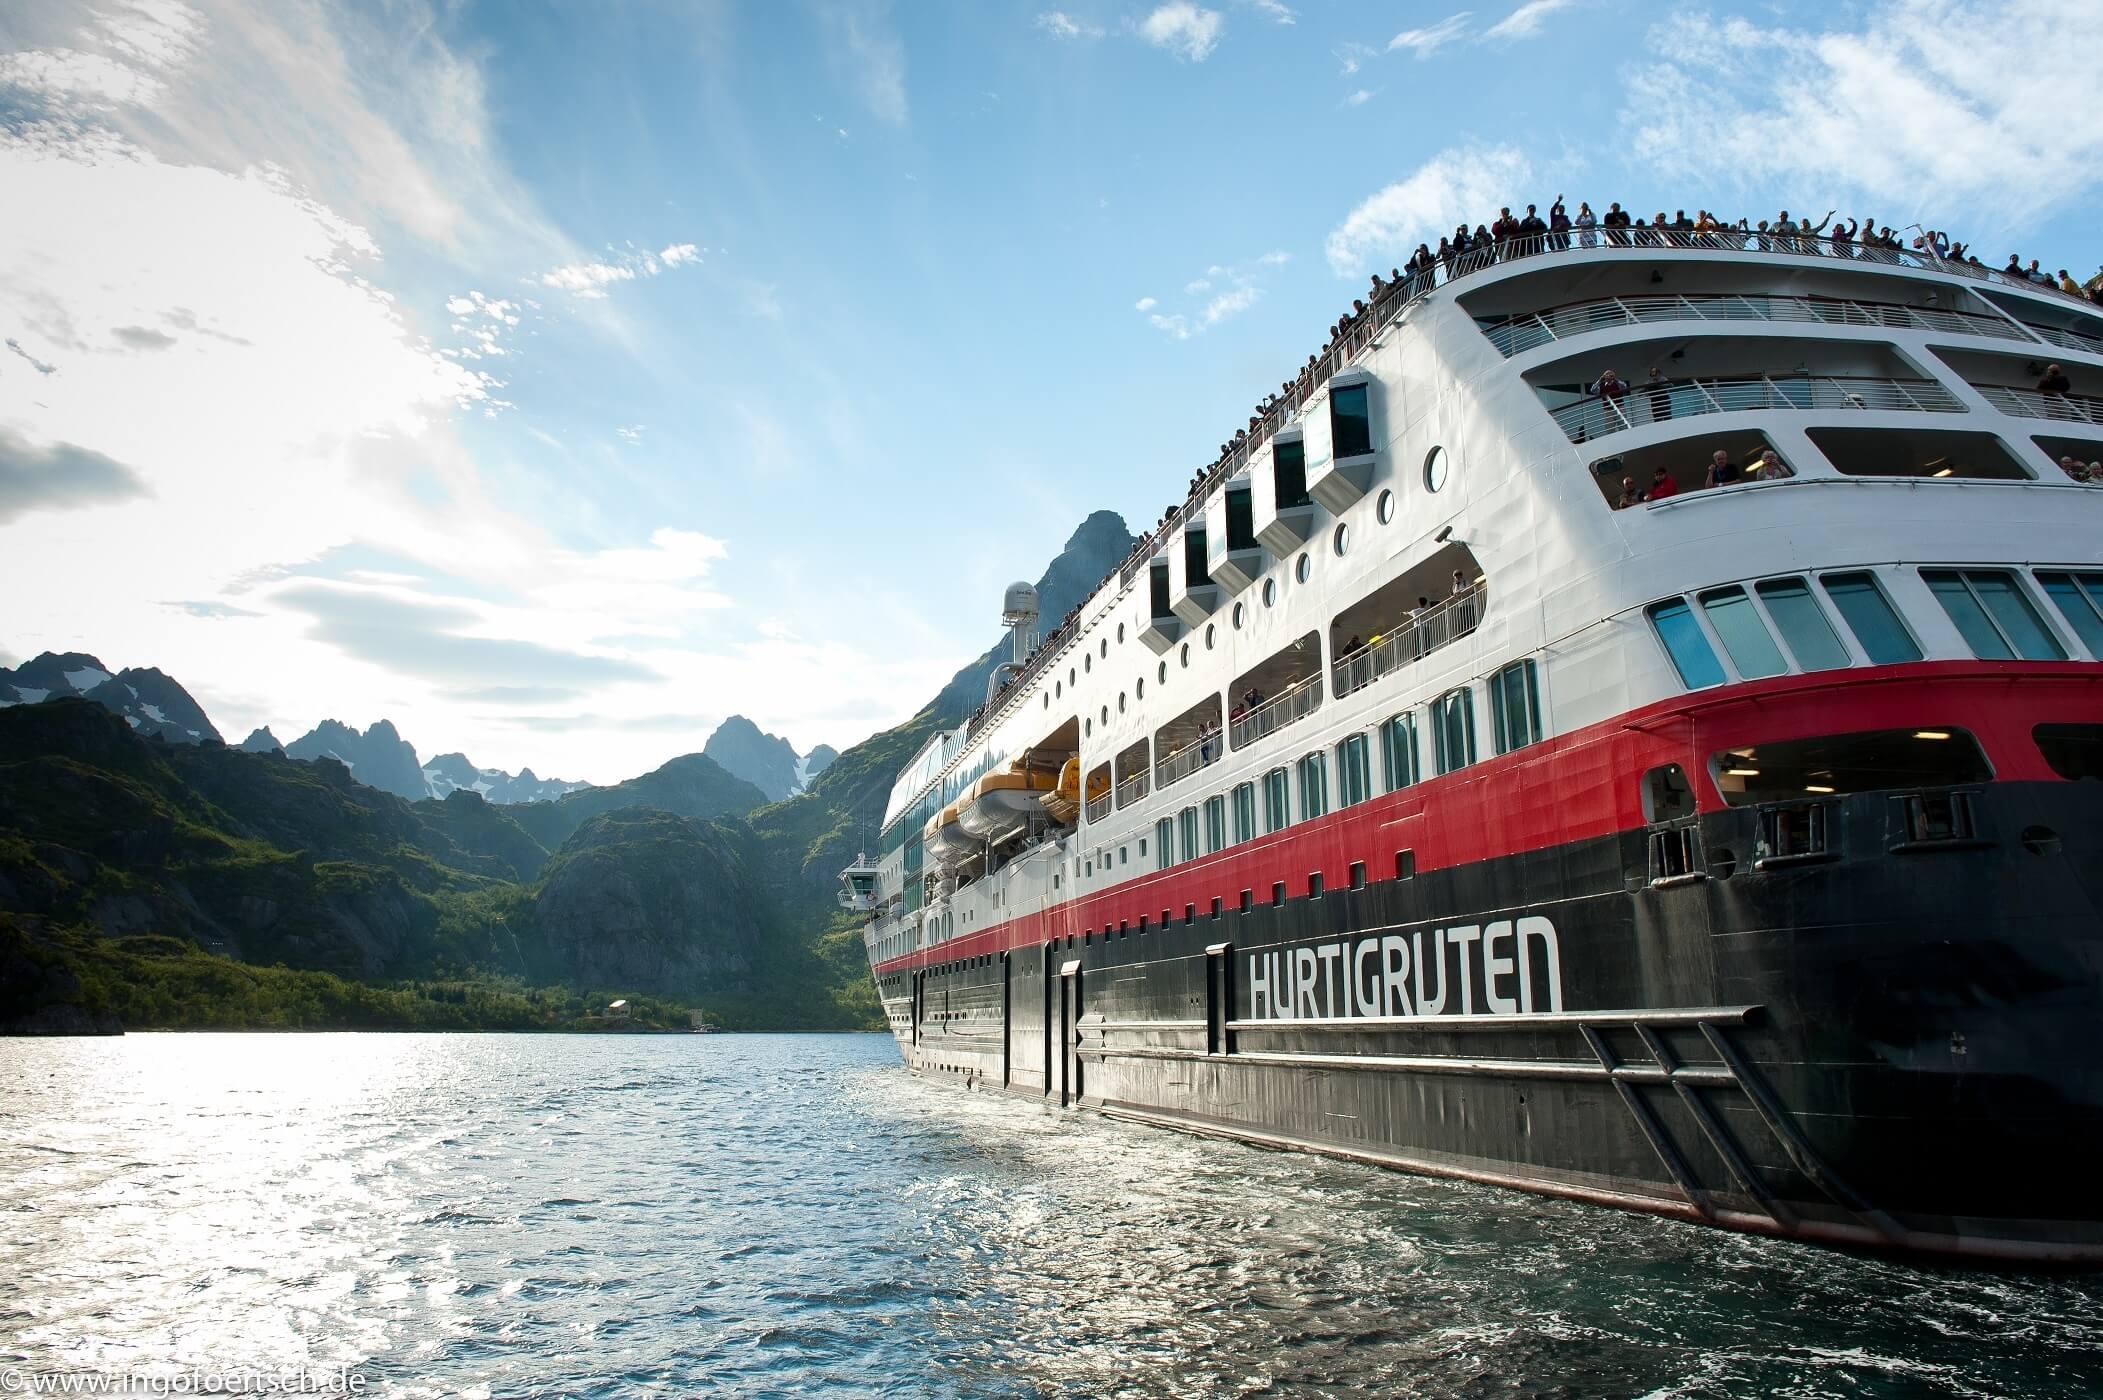 Barcos Hurtigruten